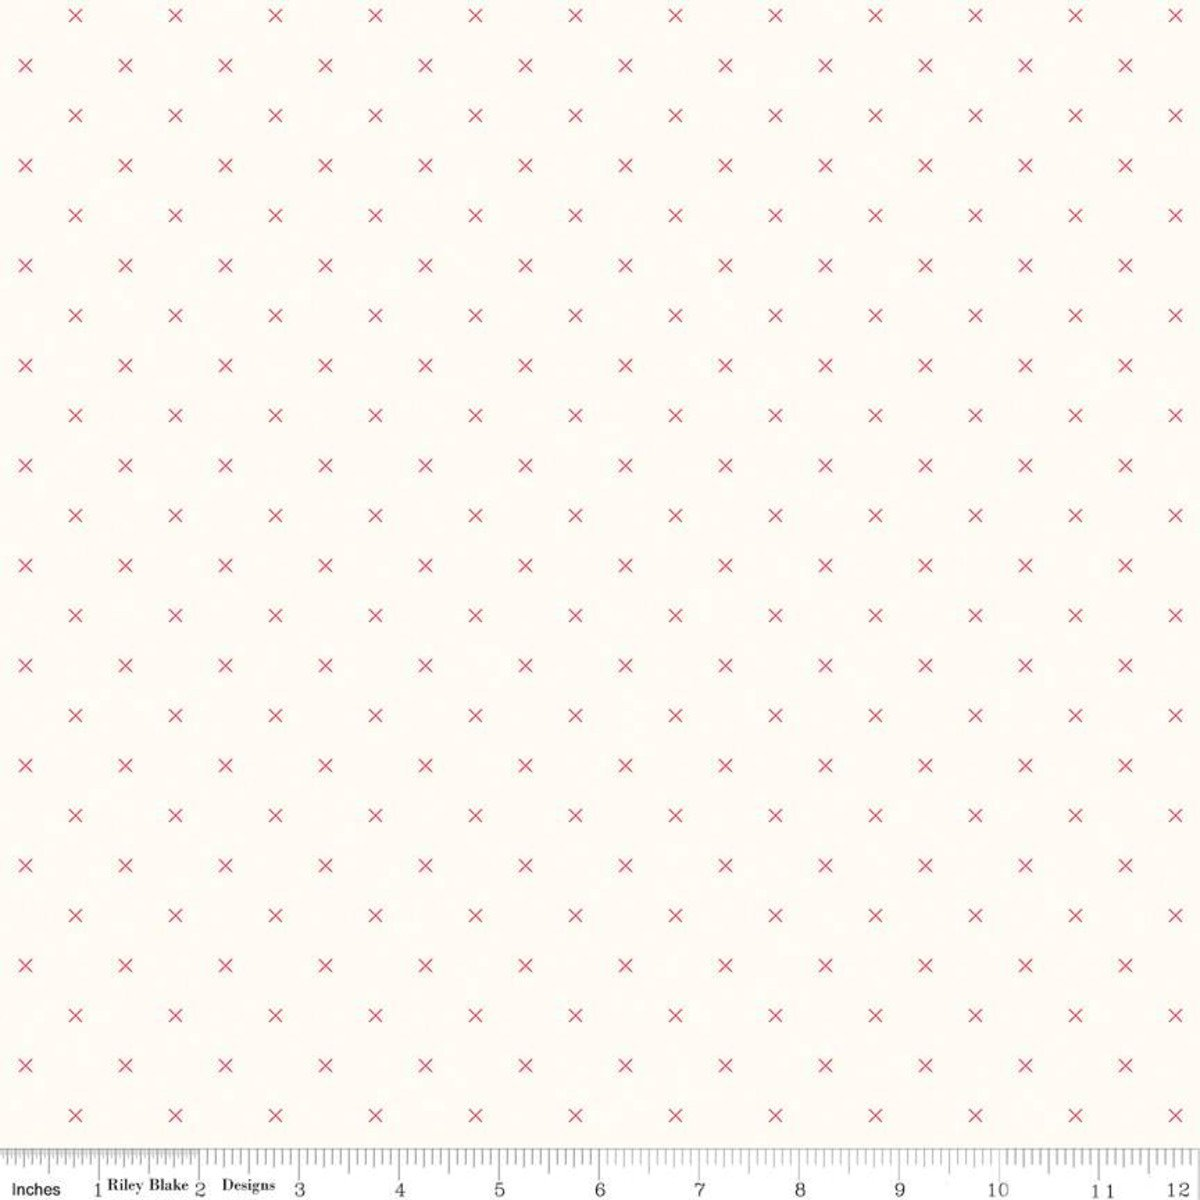 BEE BACKGROUNDS C6381 CAYENNE CROSS STITCH